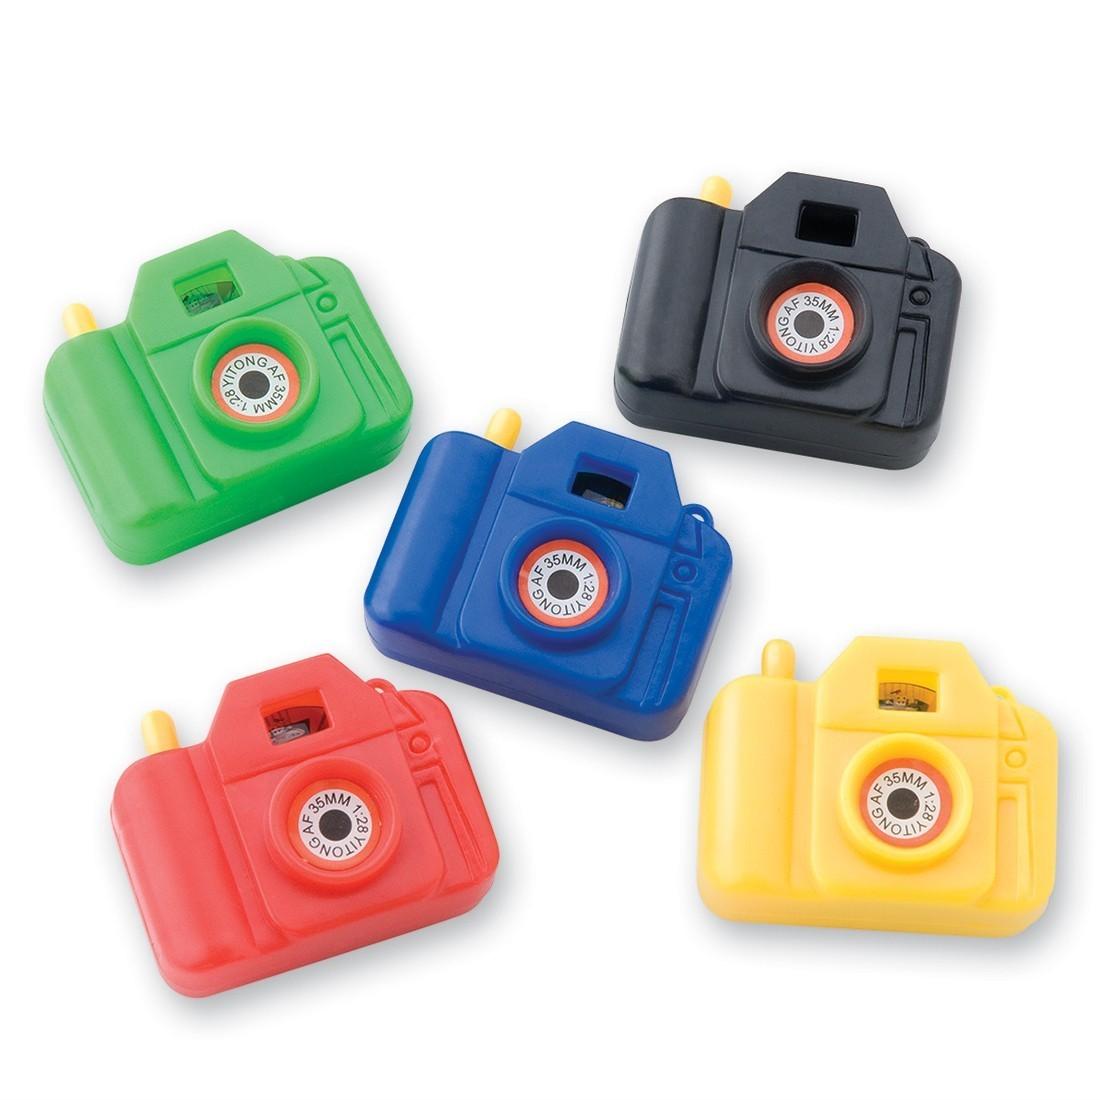 Mini Dental Camera Viewers [image]